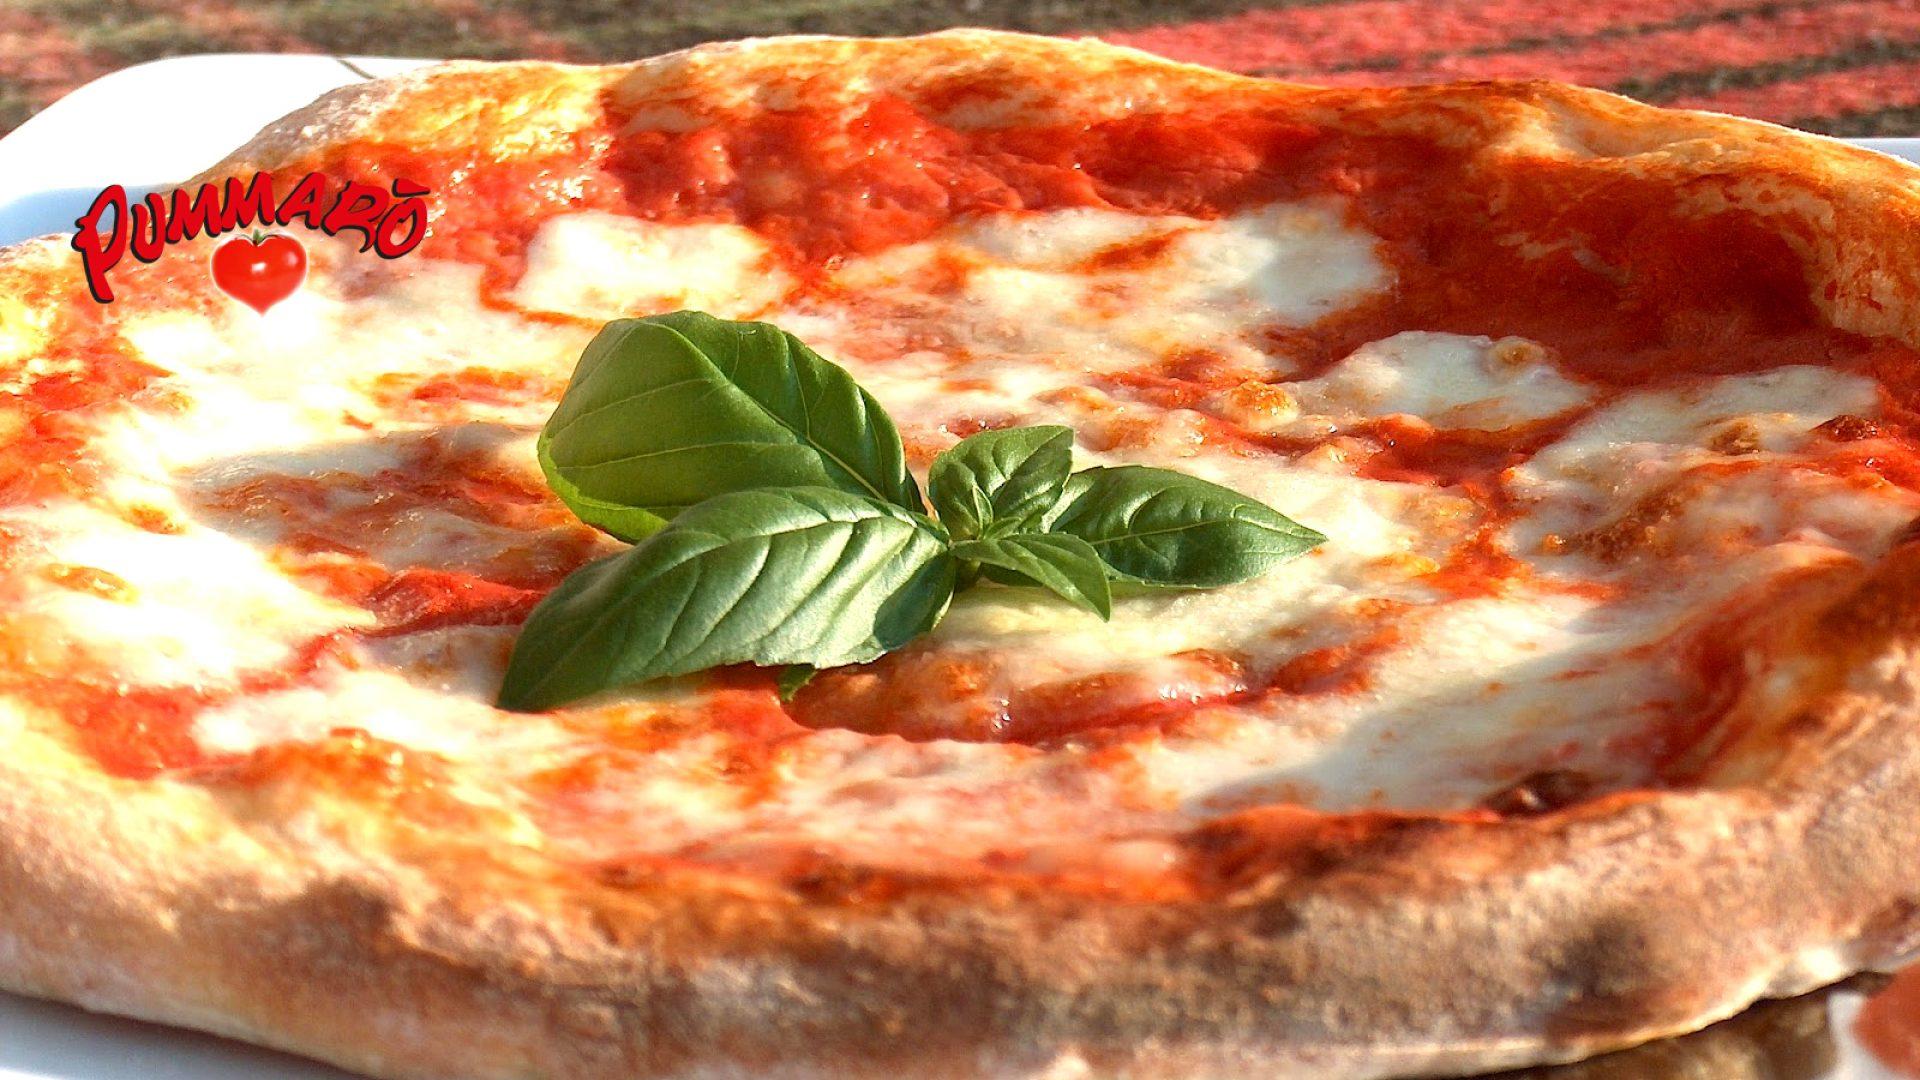 Pizzeria Pummarò